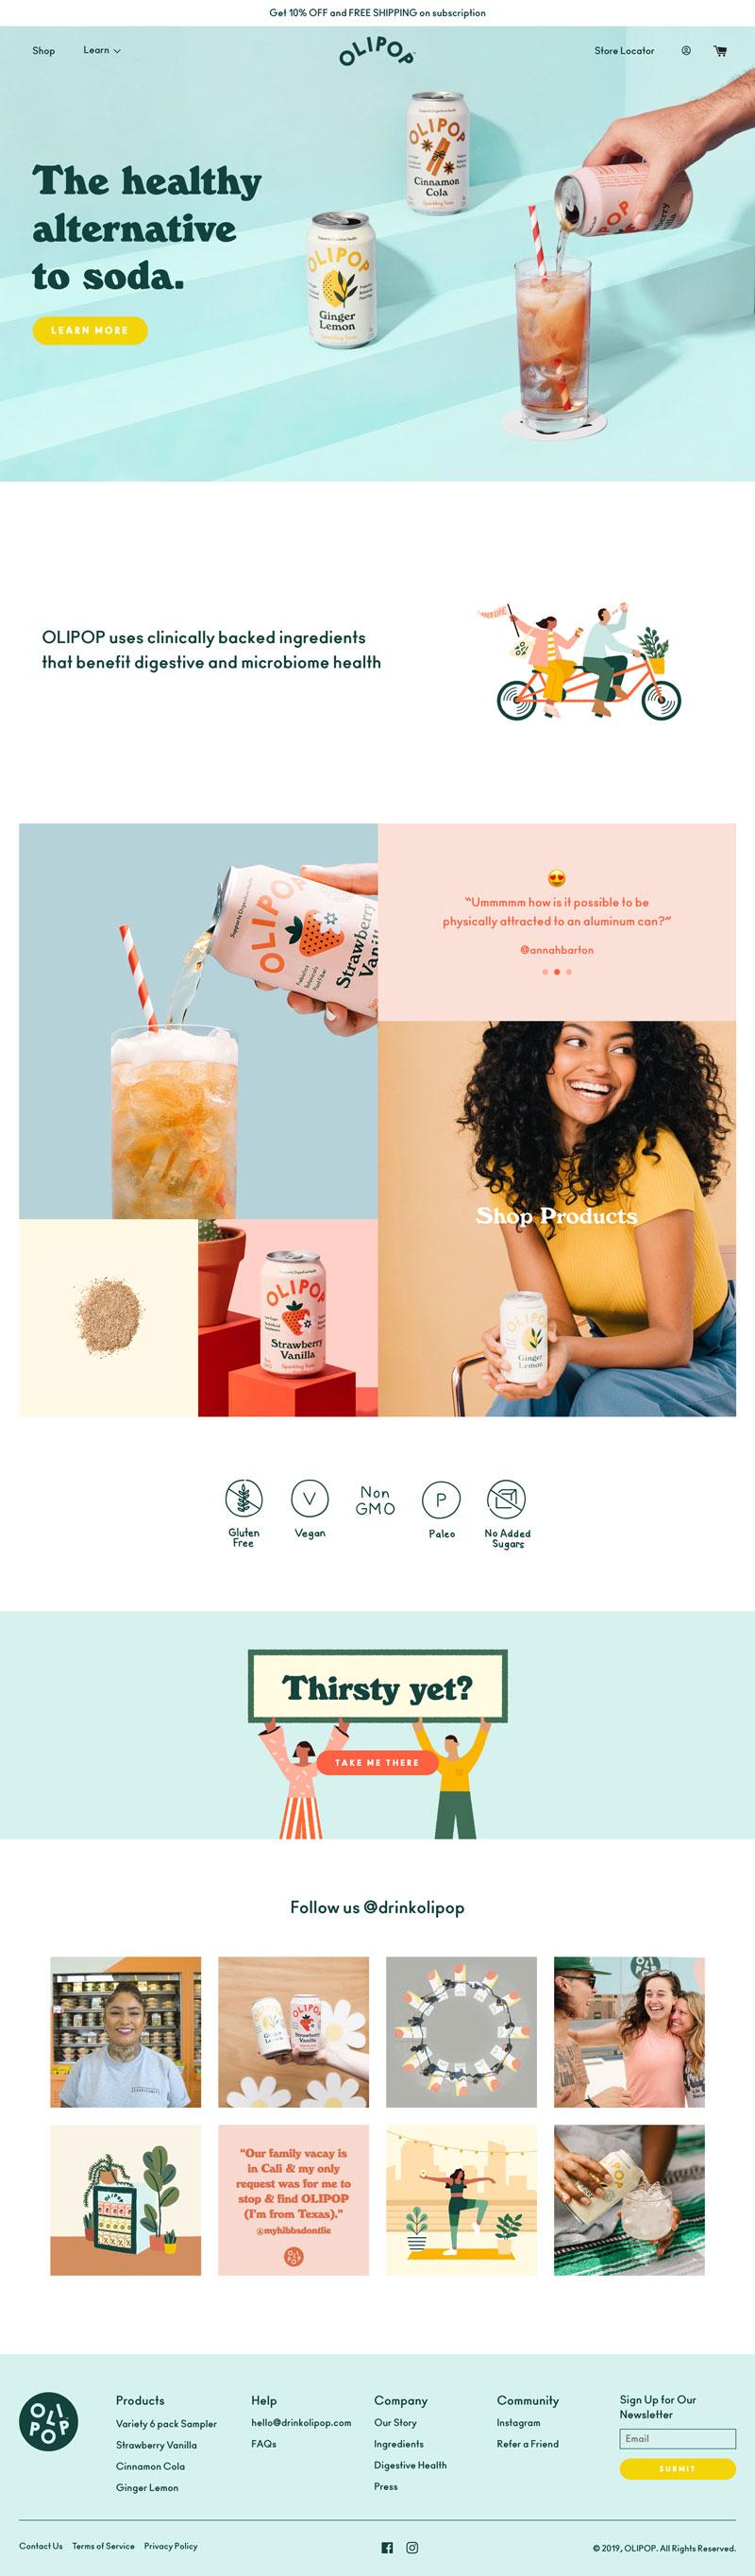 The homepage of DrinkOlipop.com.